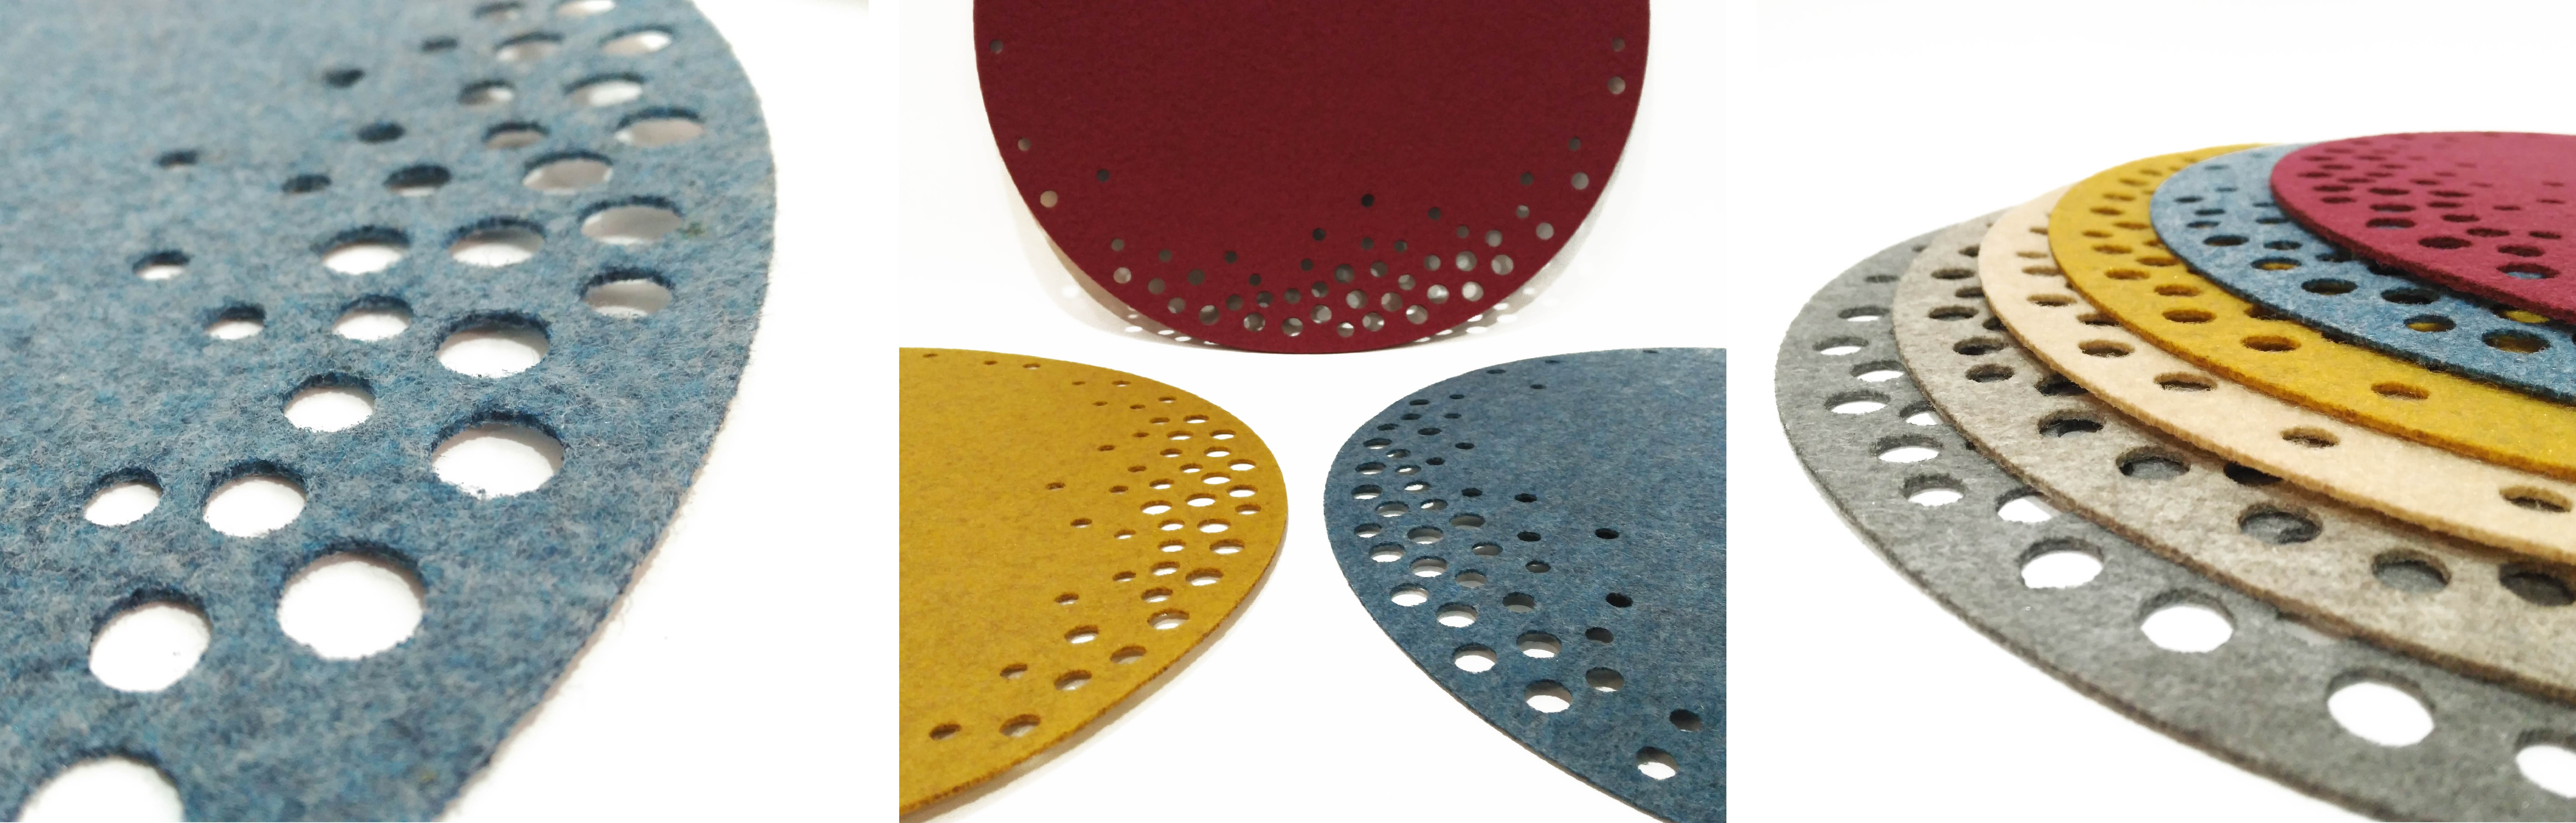 archicercle - seat mat detalle